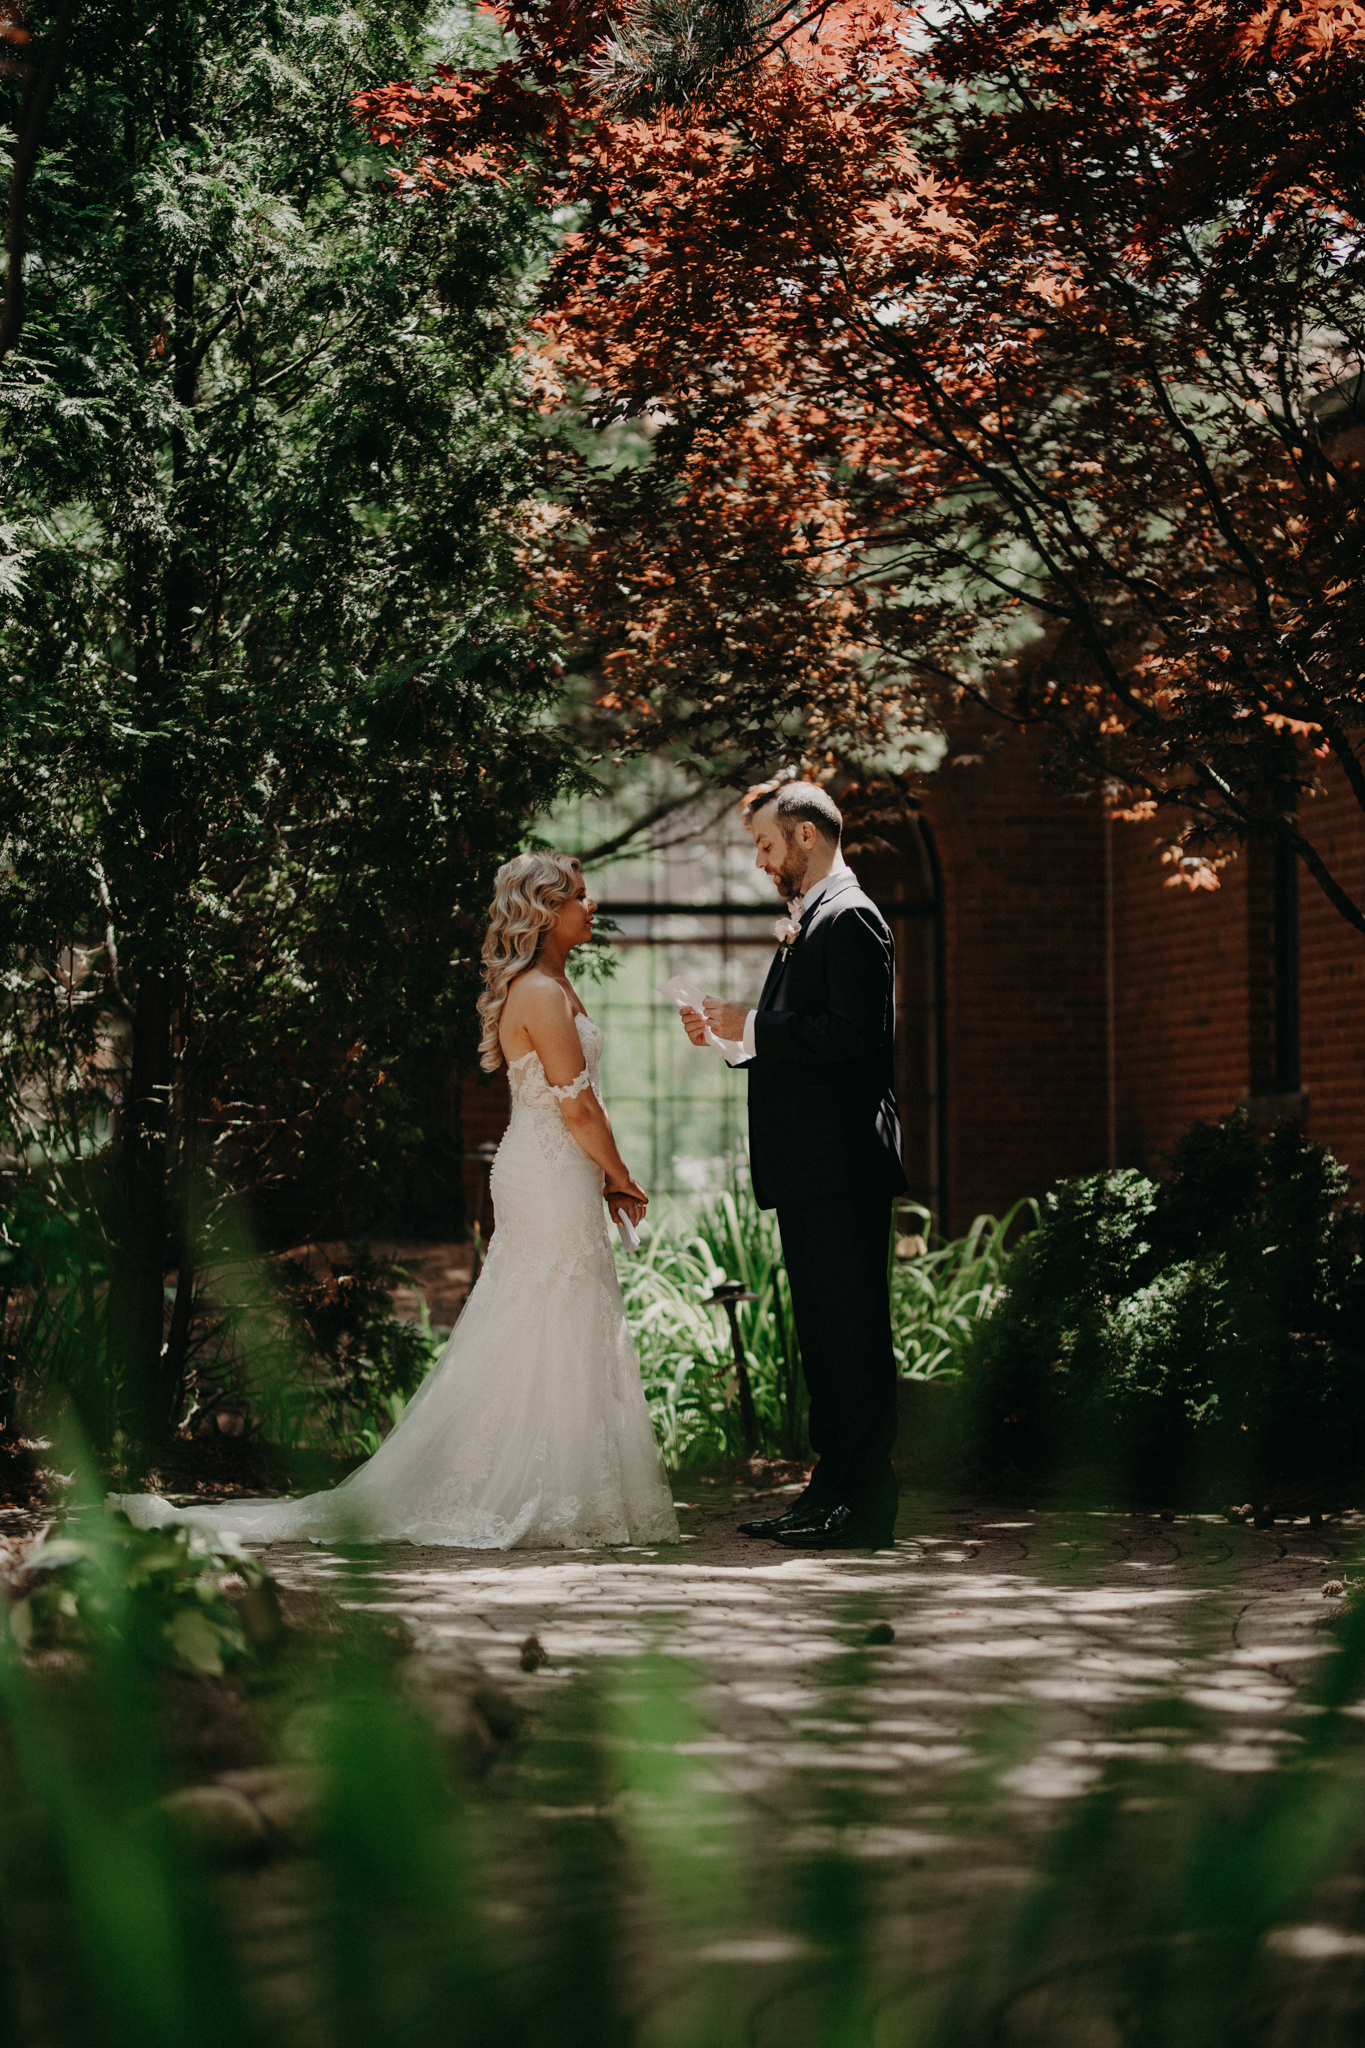 The-Inn-At-St-Johns-Wedding-15.jpg